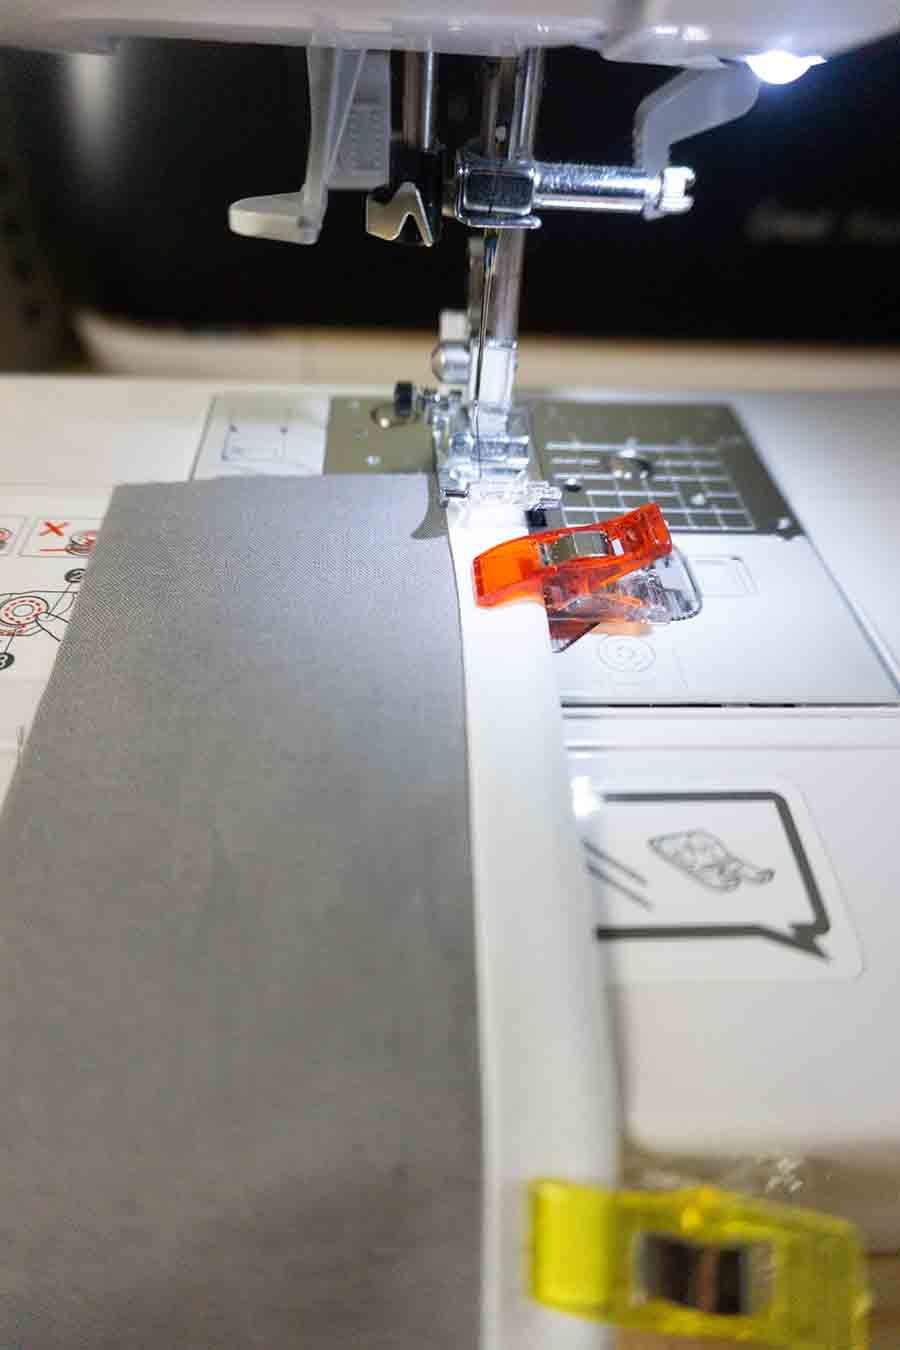 Sew bias tape to wallet pieces